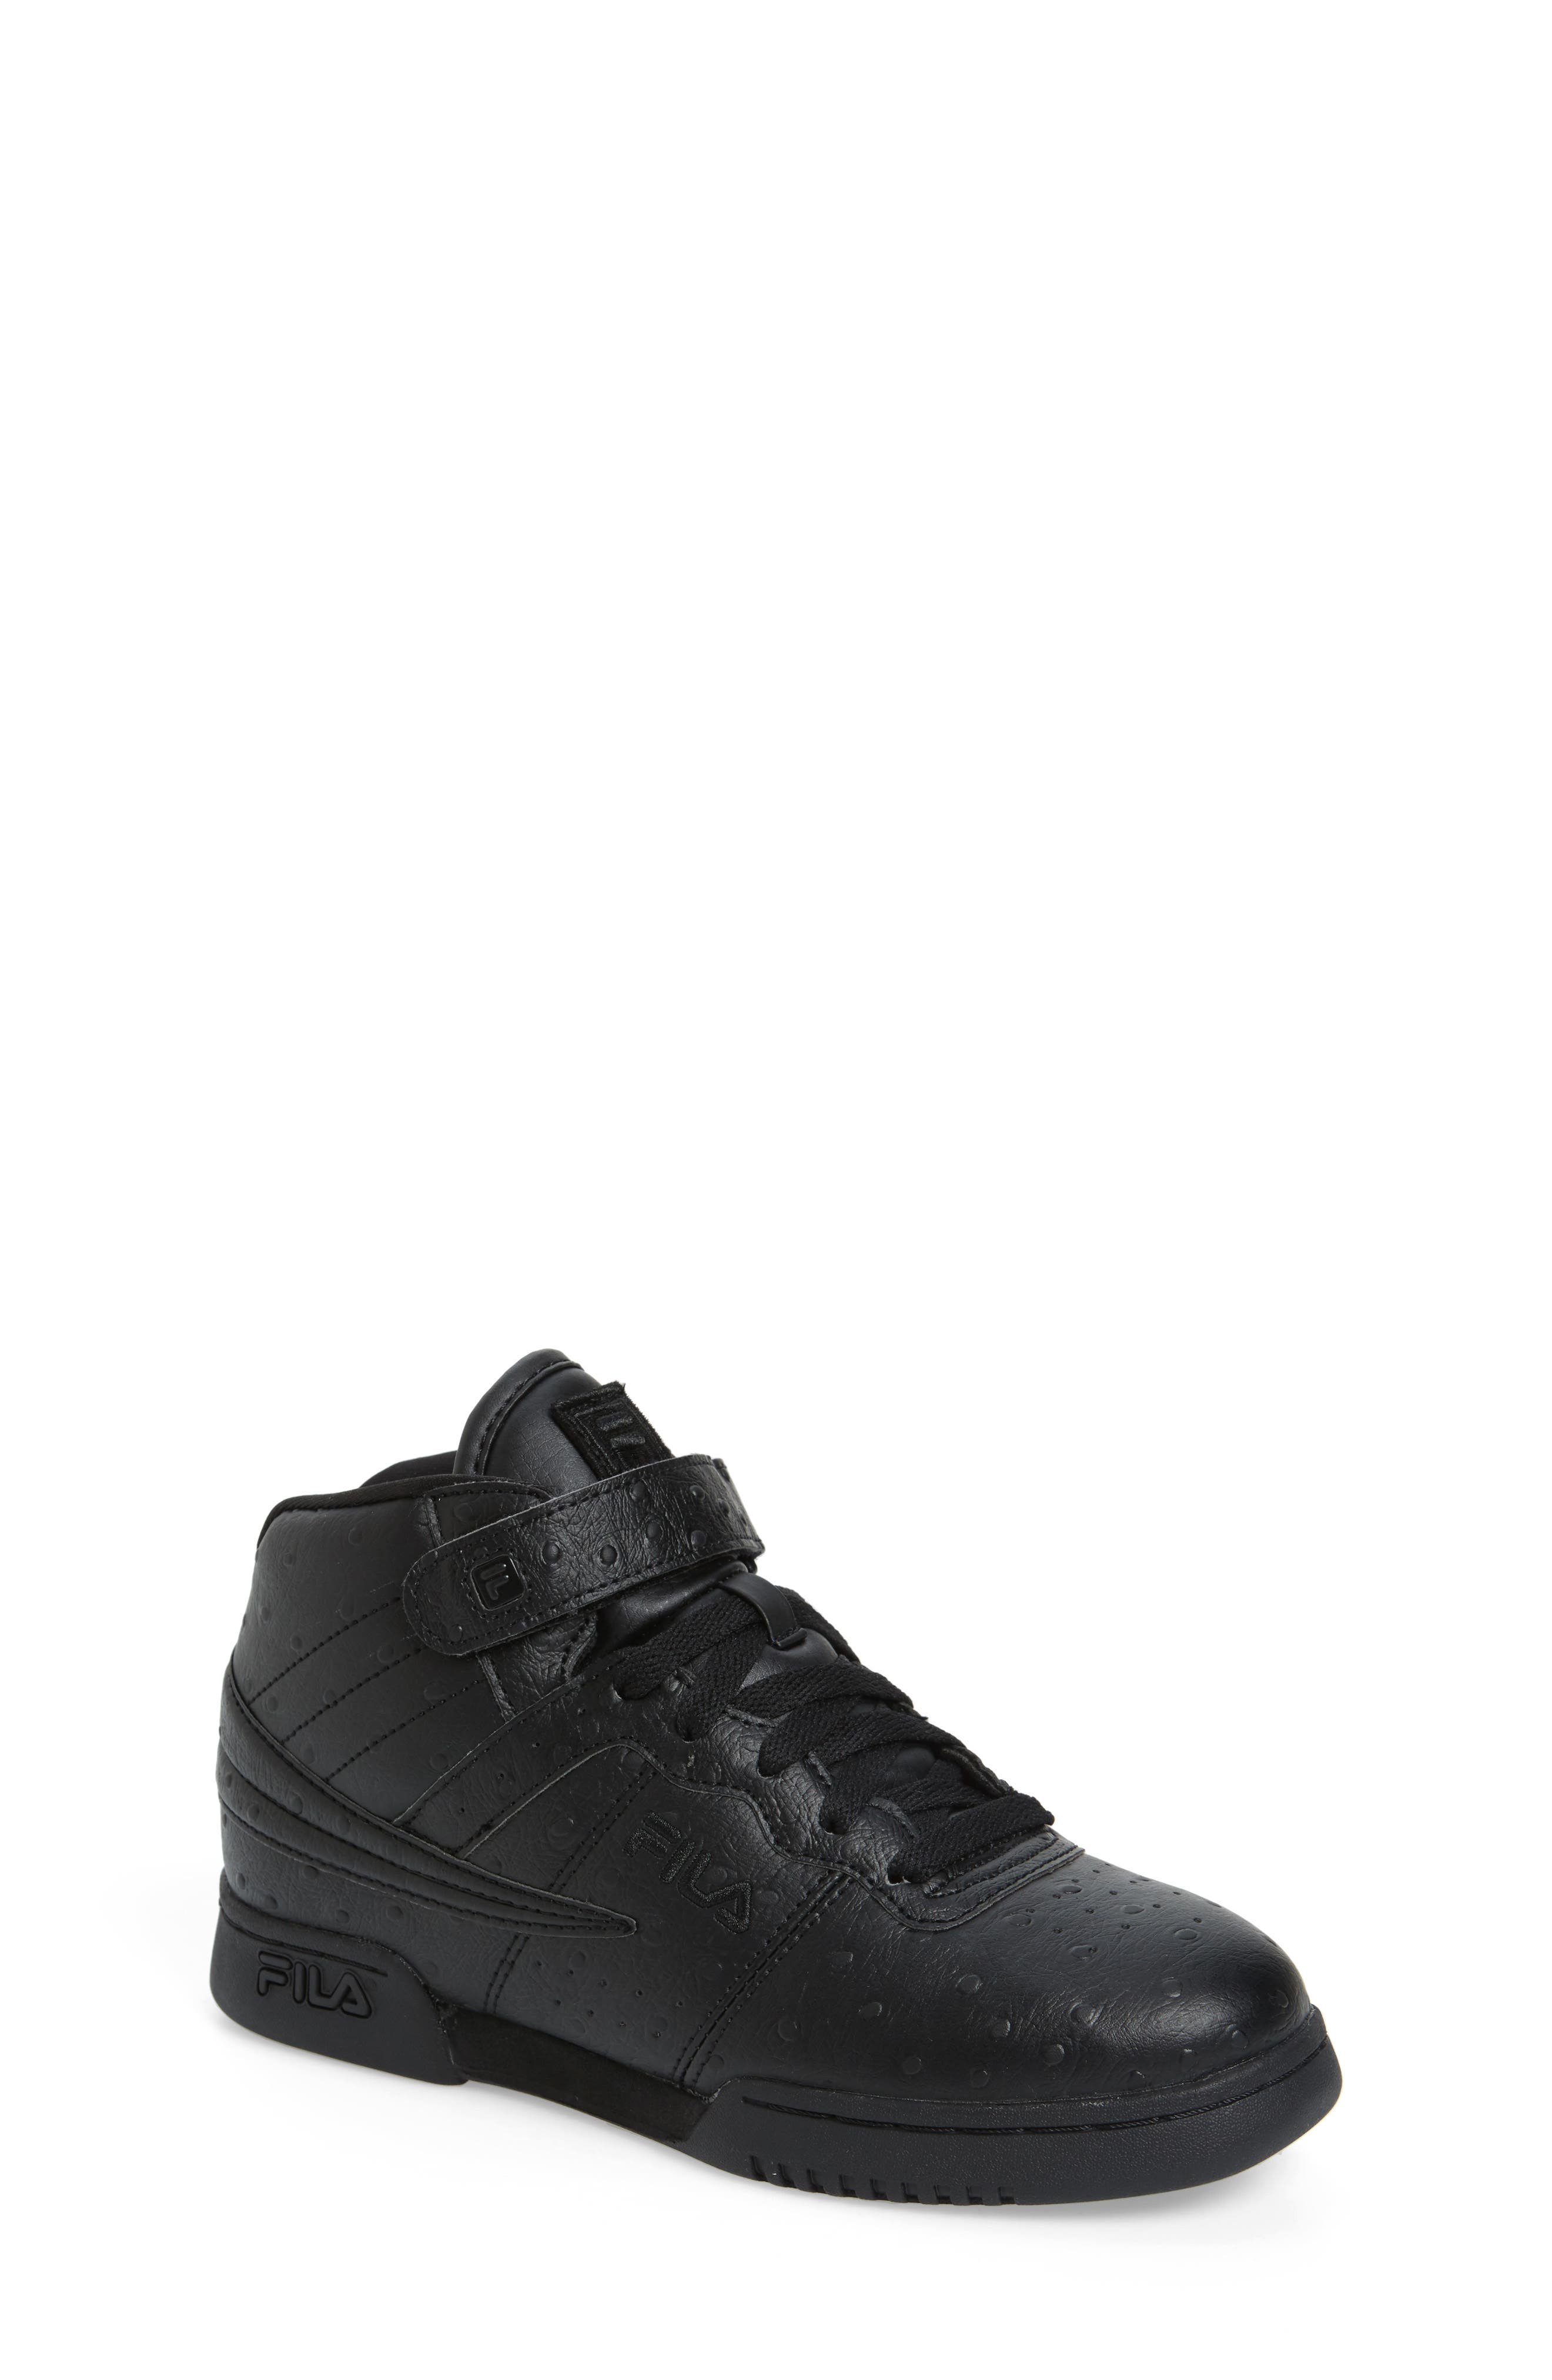 FILA F-13 Ostrich Embossed High Top Sneaker, Main, color, TRIPLE BLACK